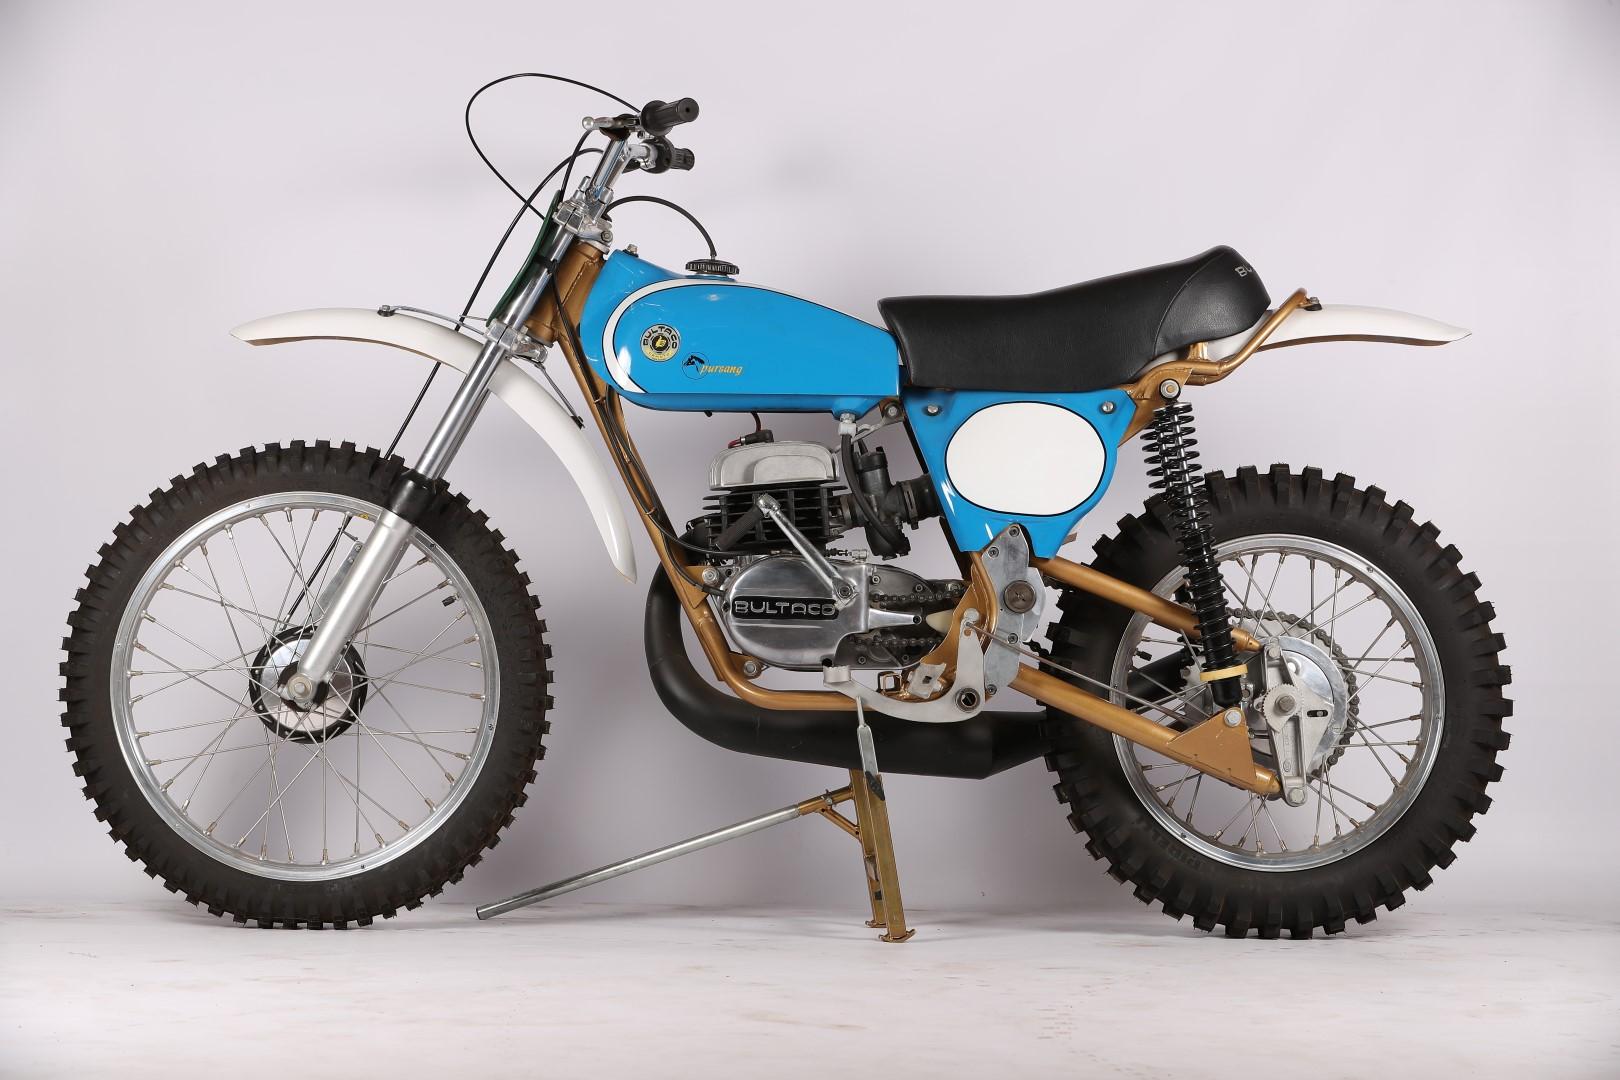 Bultaco Pursang MK8 «Dual Link» 1974